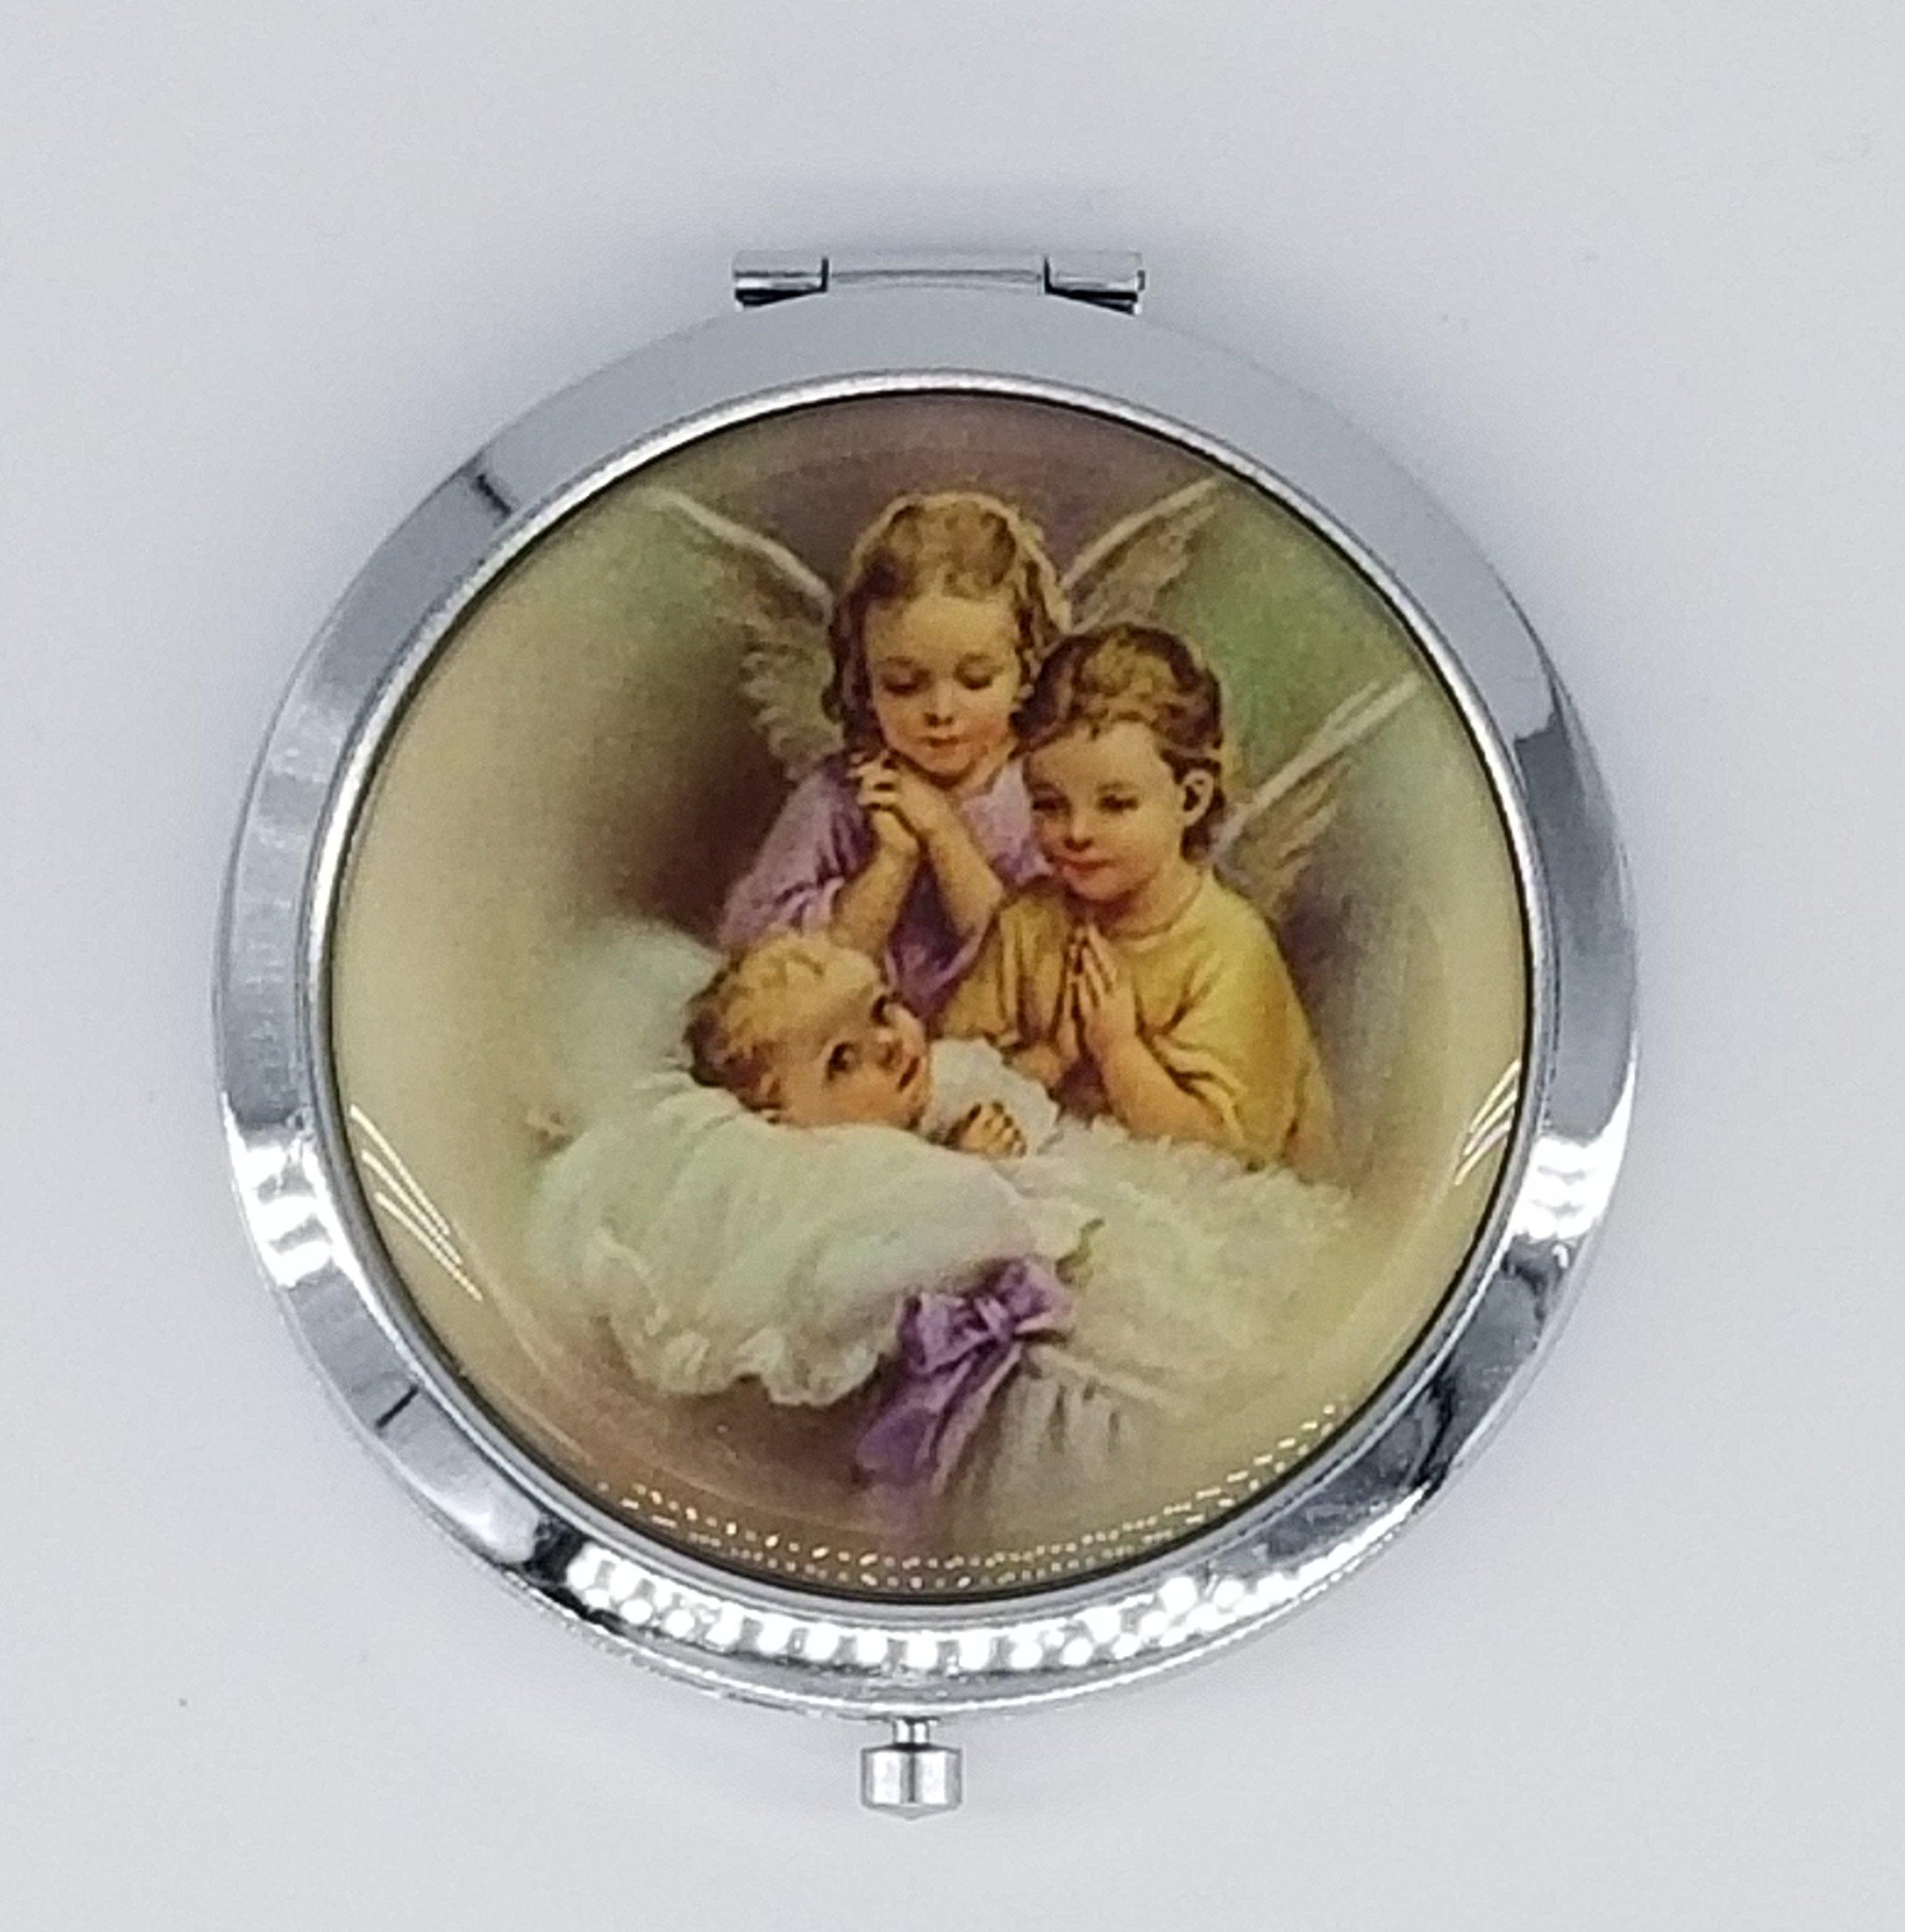 12 pcs Personalized Guardian Angel Baptism Double Compact Mirror Recuerdos de Bautizo party favors for Boy and Girl